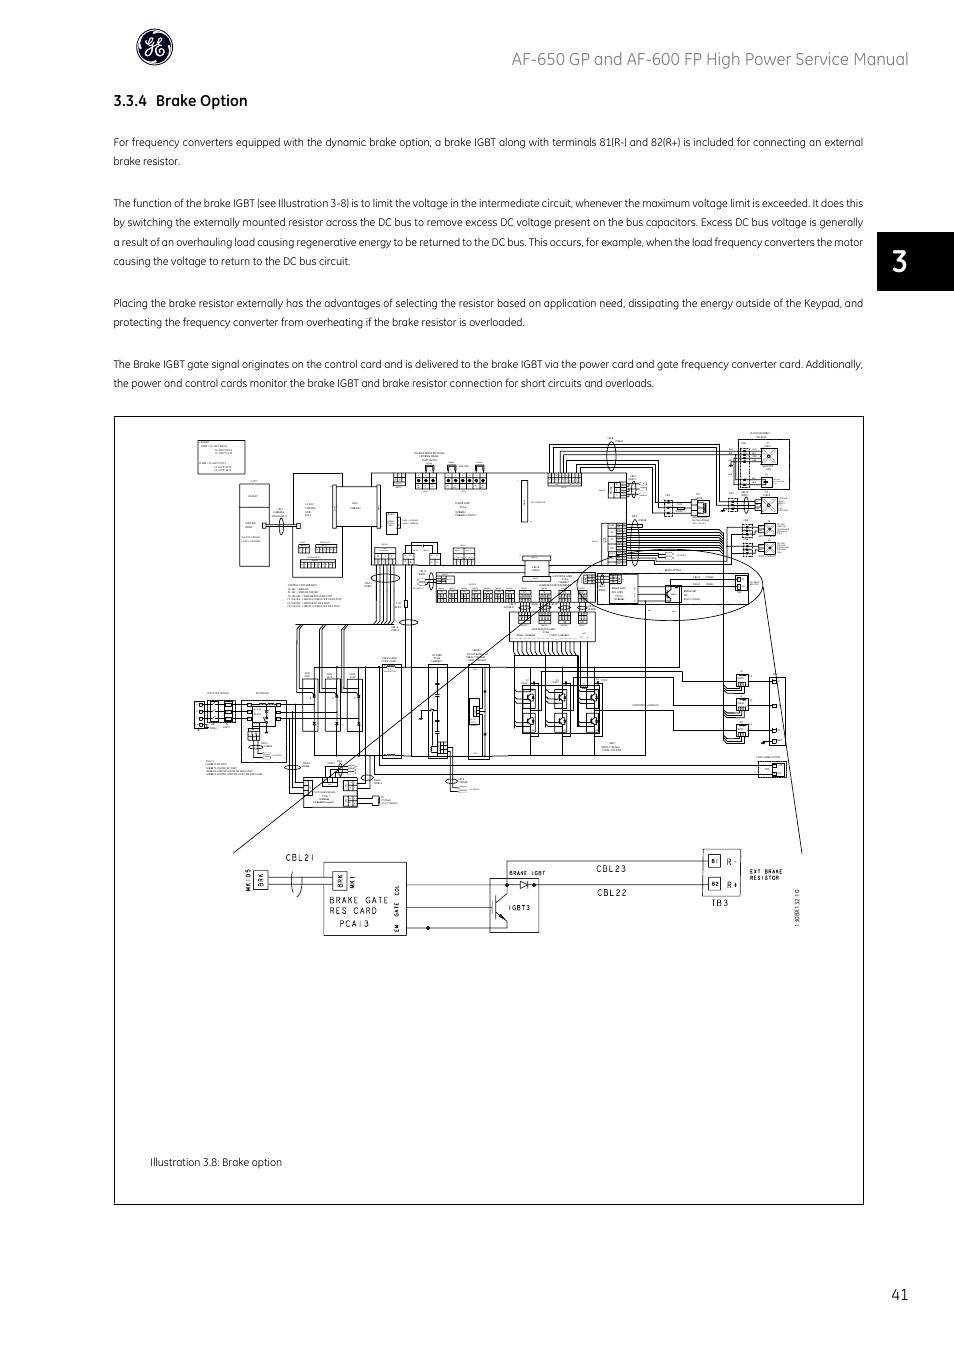 medium resolution of 4 brake option s l2 t l3 m sensors current scr gate